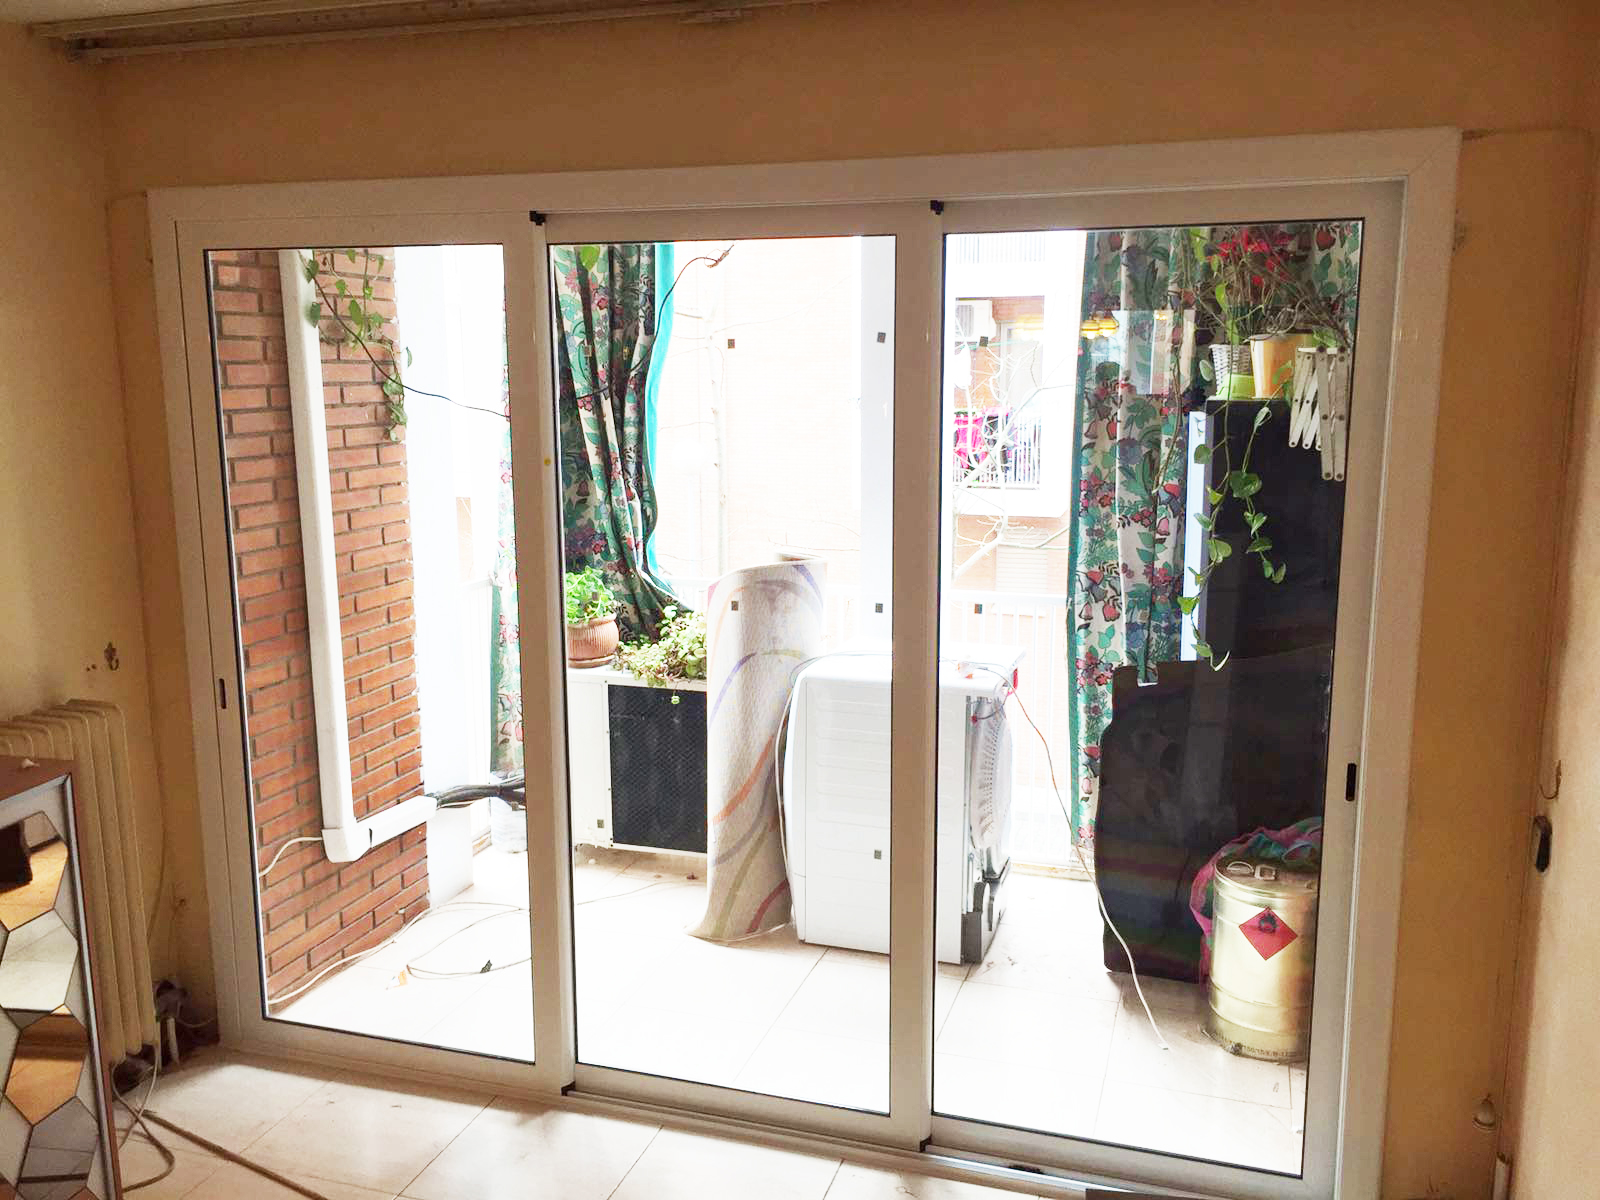 Persiauto instalaci n carpinter a de aluminio - Puerta balconera aluminio ...